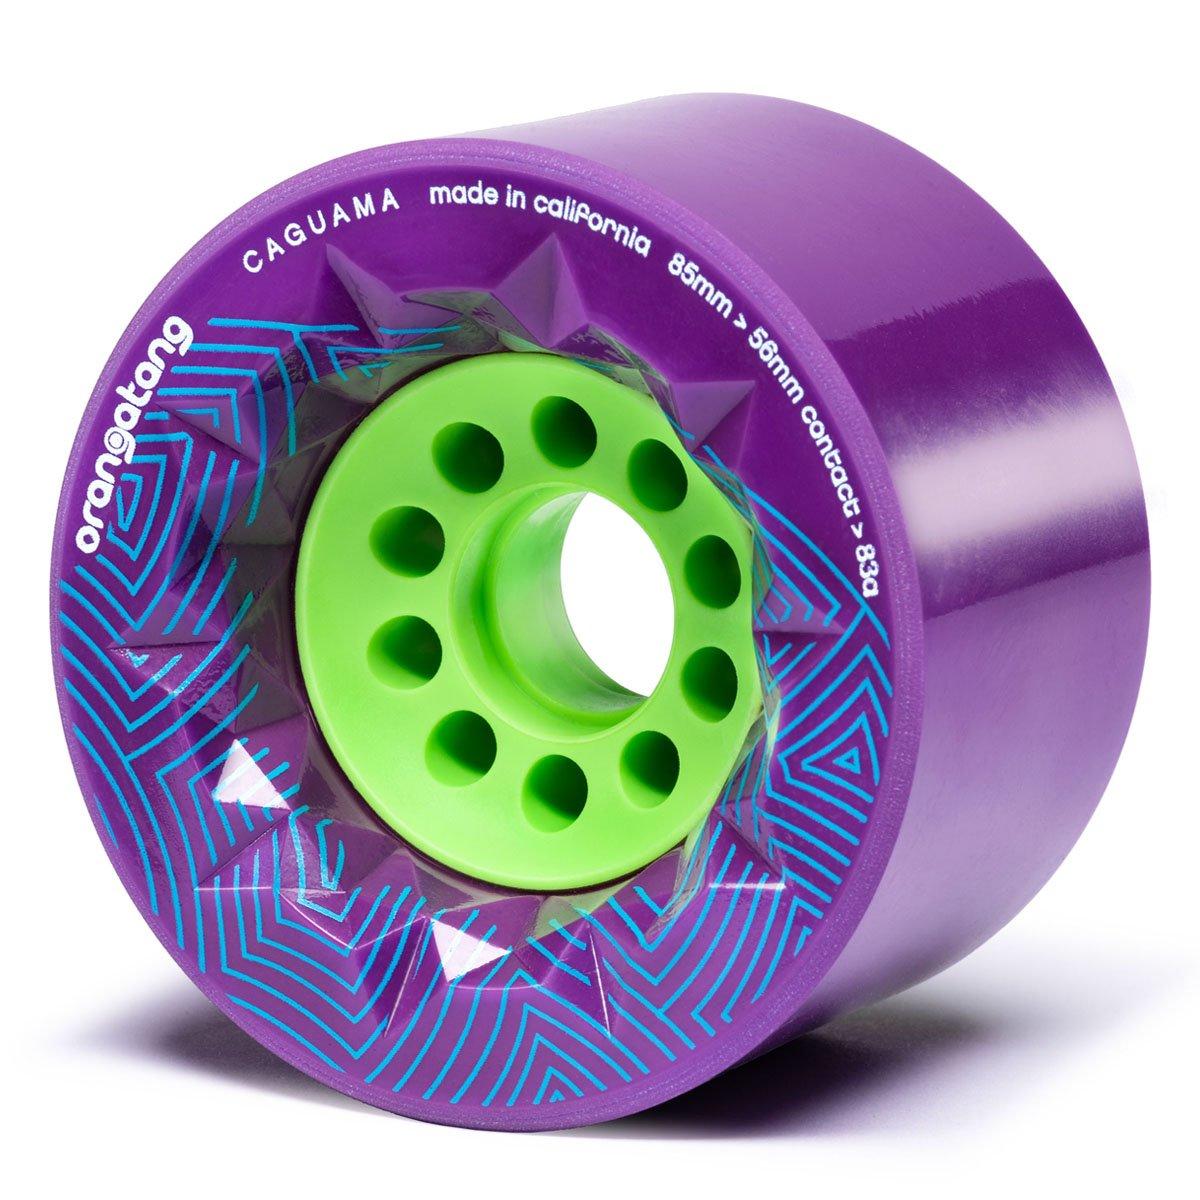 Orangatang Caguama 85 mm 83a Downhill Longboard Skateboard Cruising Wheels (Purple, Set of 4) by Orangatang